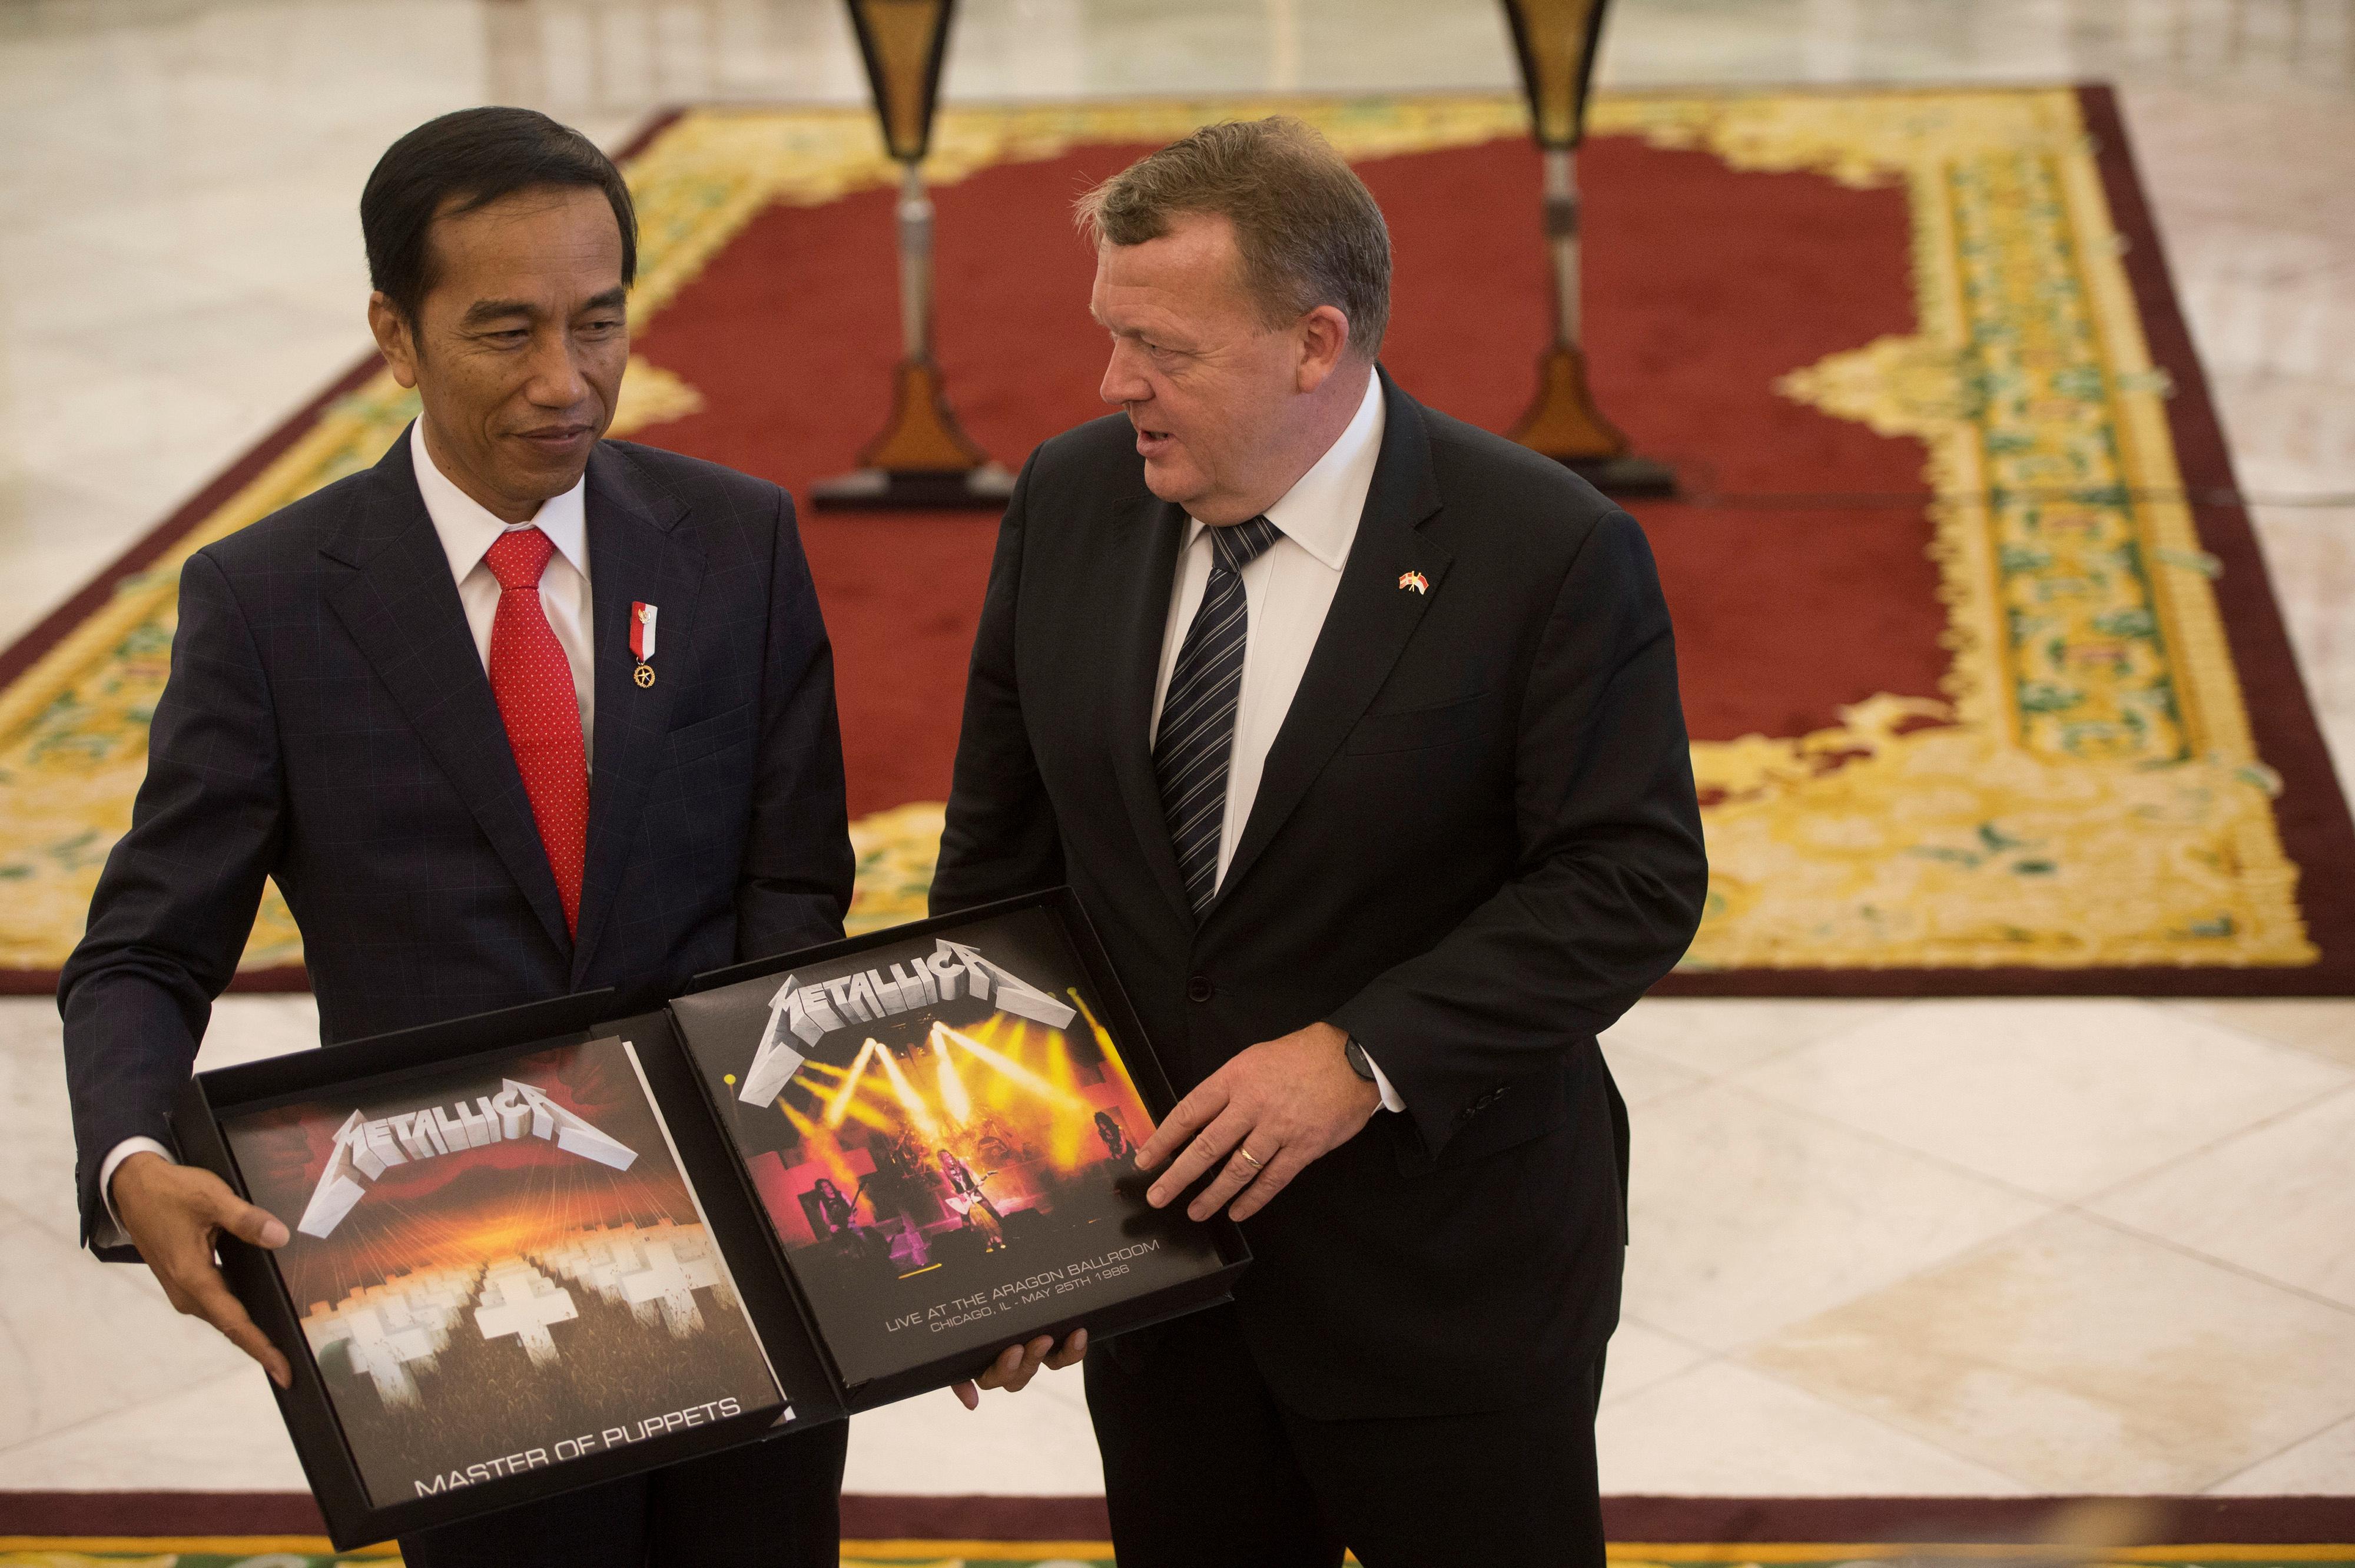 Indonesian President Joko Widodo receives a Metallica vinyl record from Denmark's Prime Minister Lars Lokke Rasmussen in Bogor, Indonesia on Nov. 28, 2017.